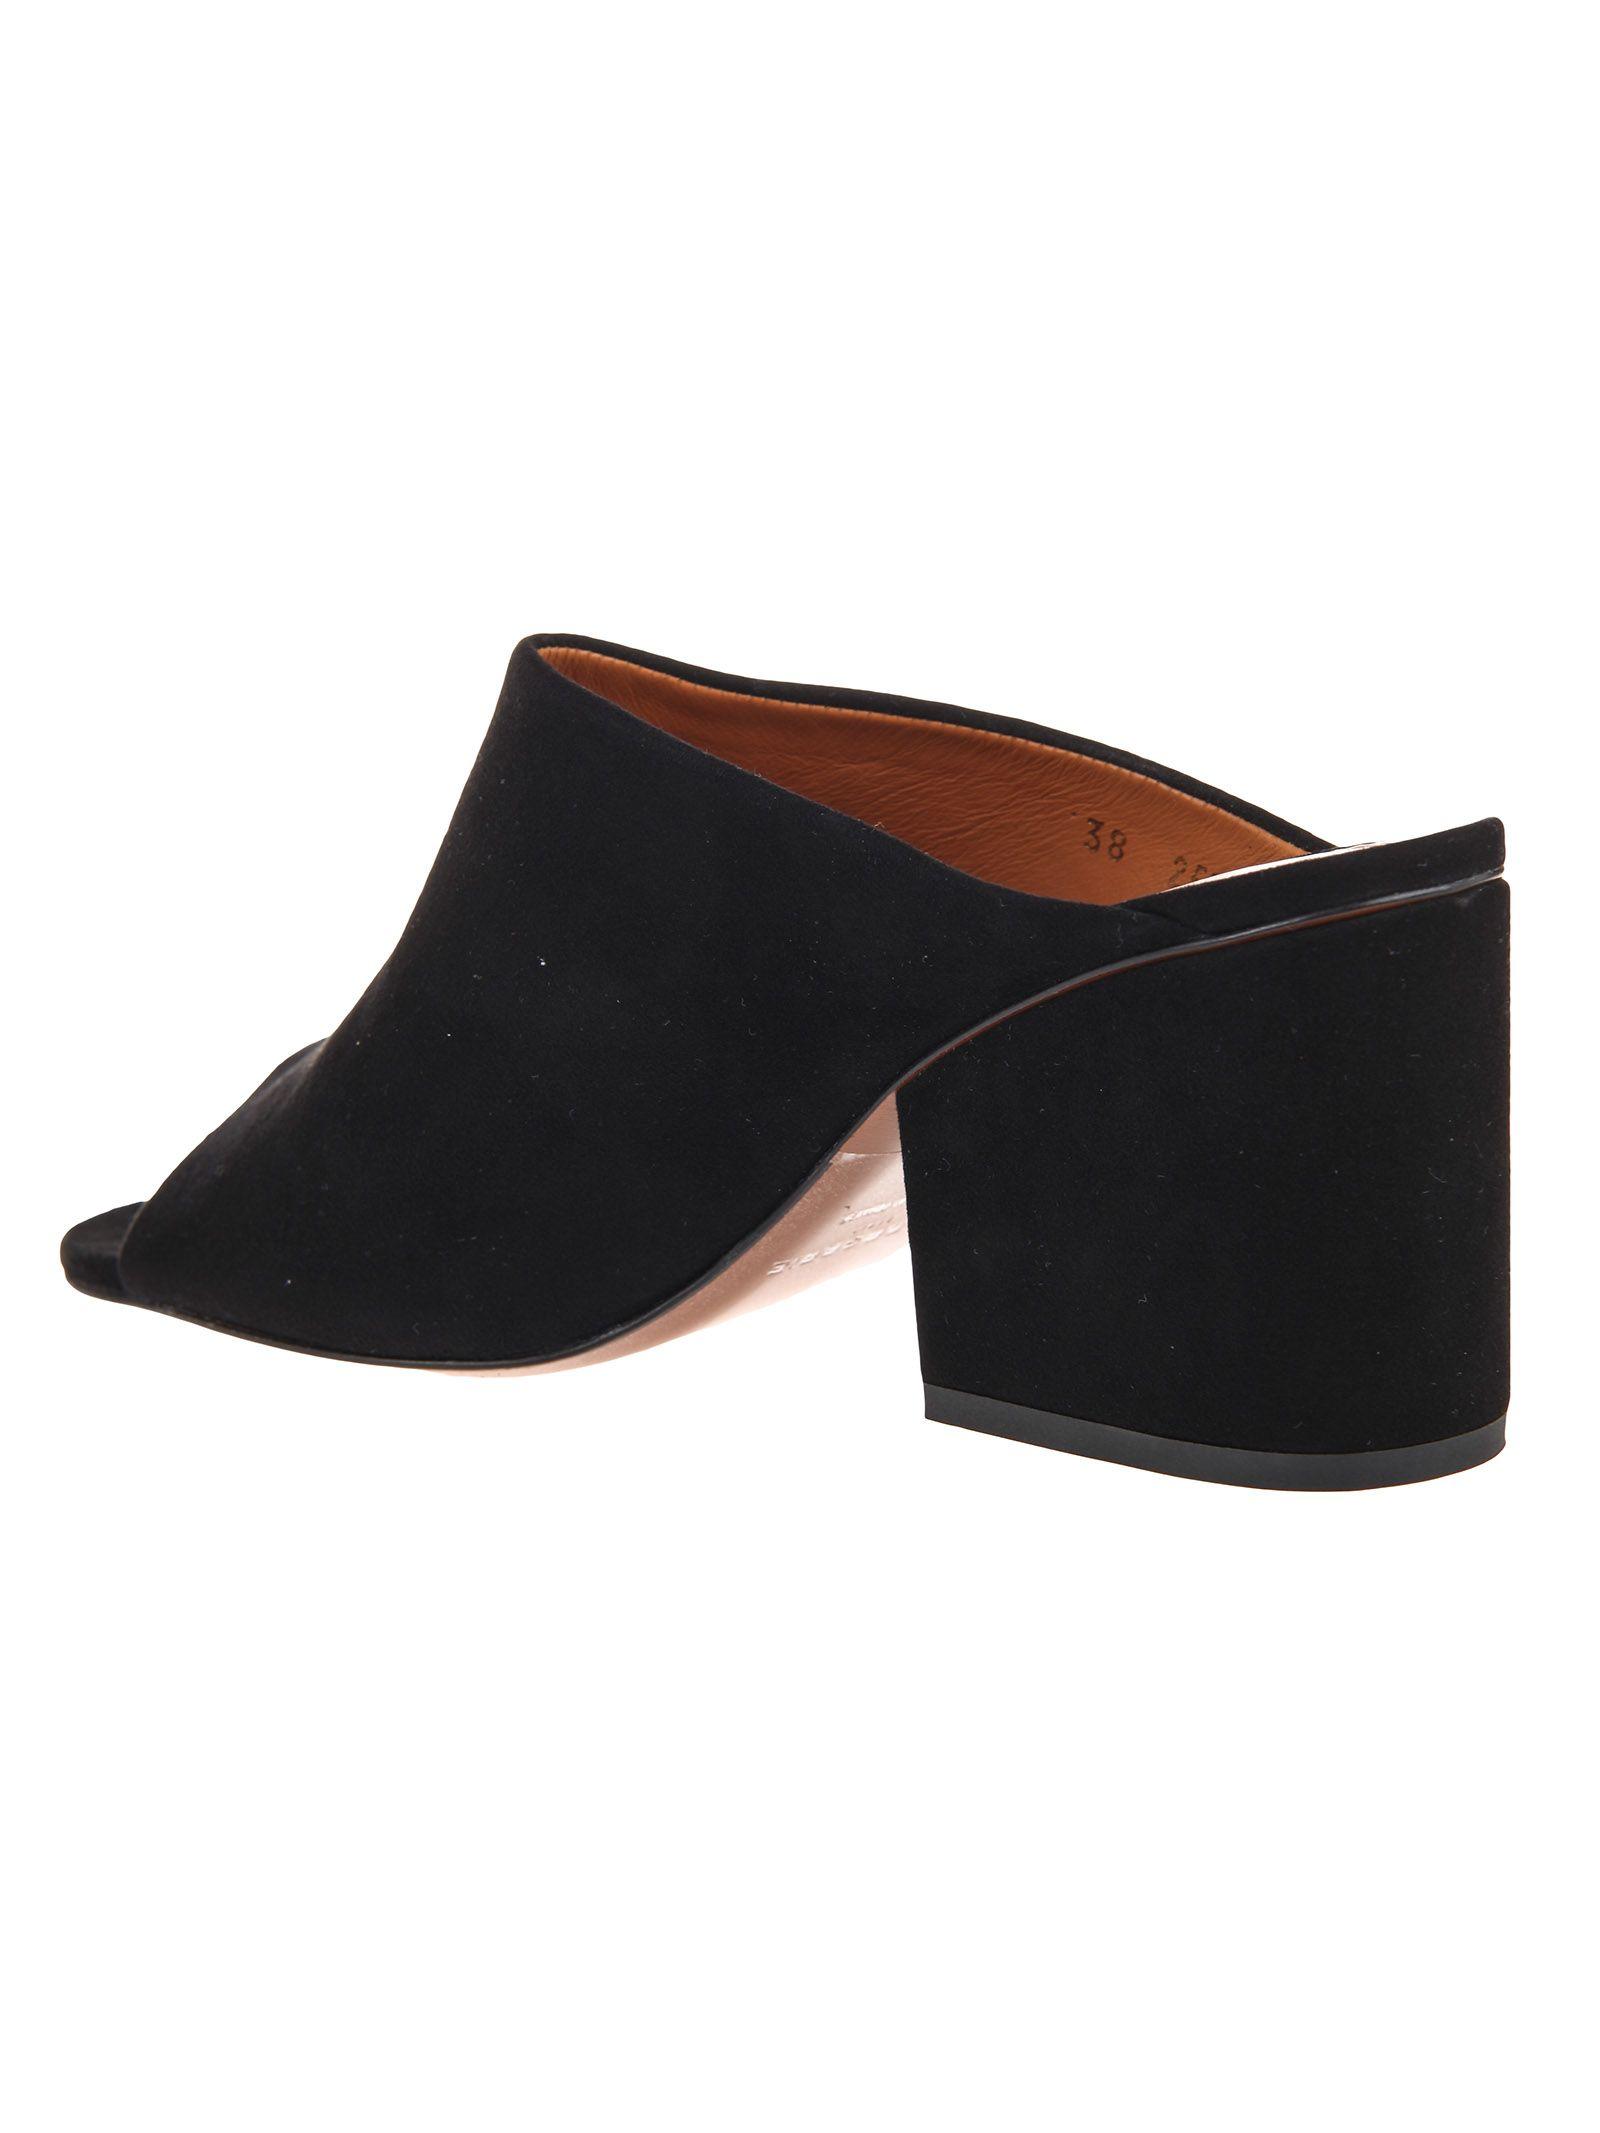 Cheap Sale Fashion Style Robert Clergerie Classic Mules Original pJ7hHe0z8N